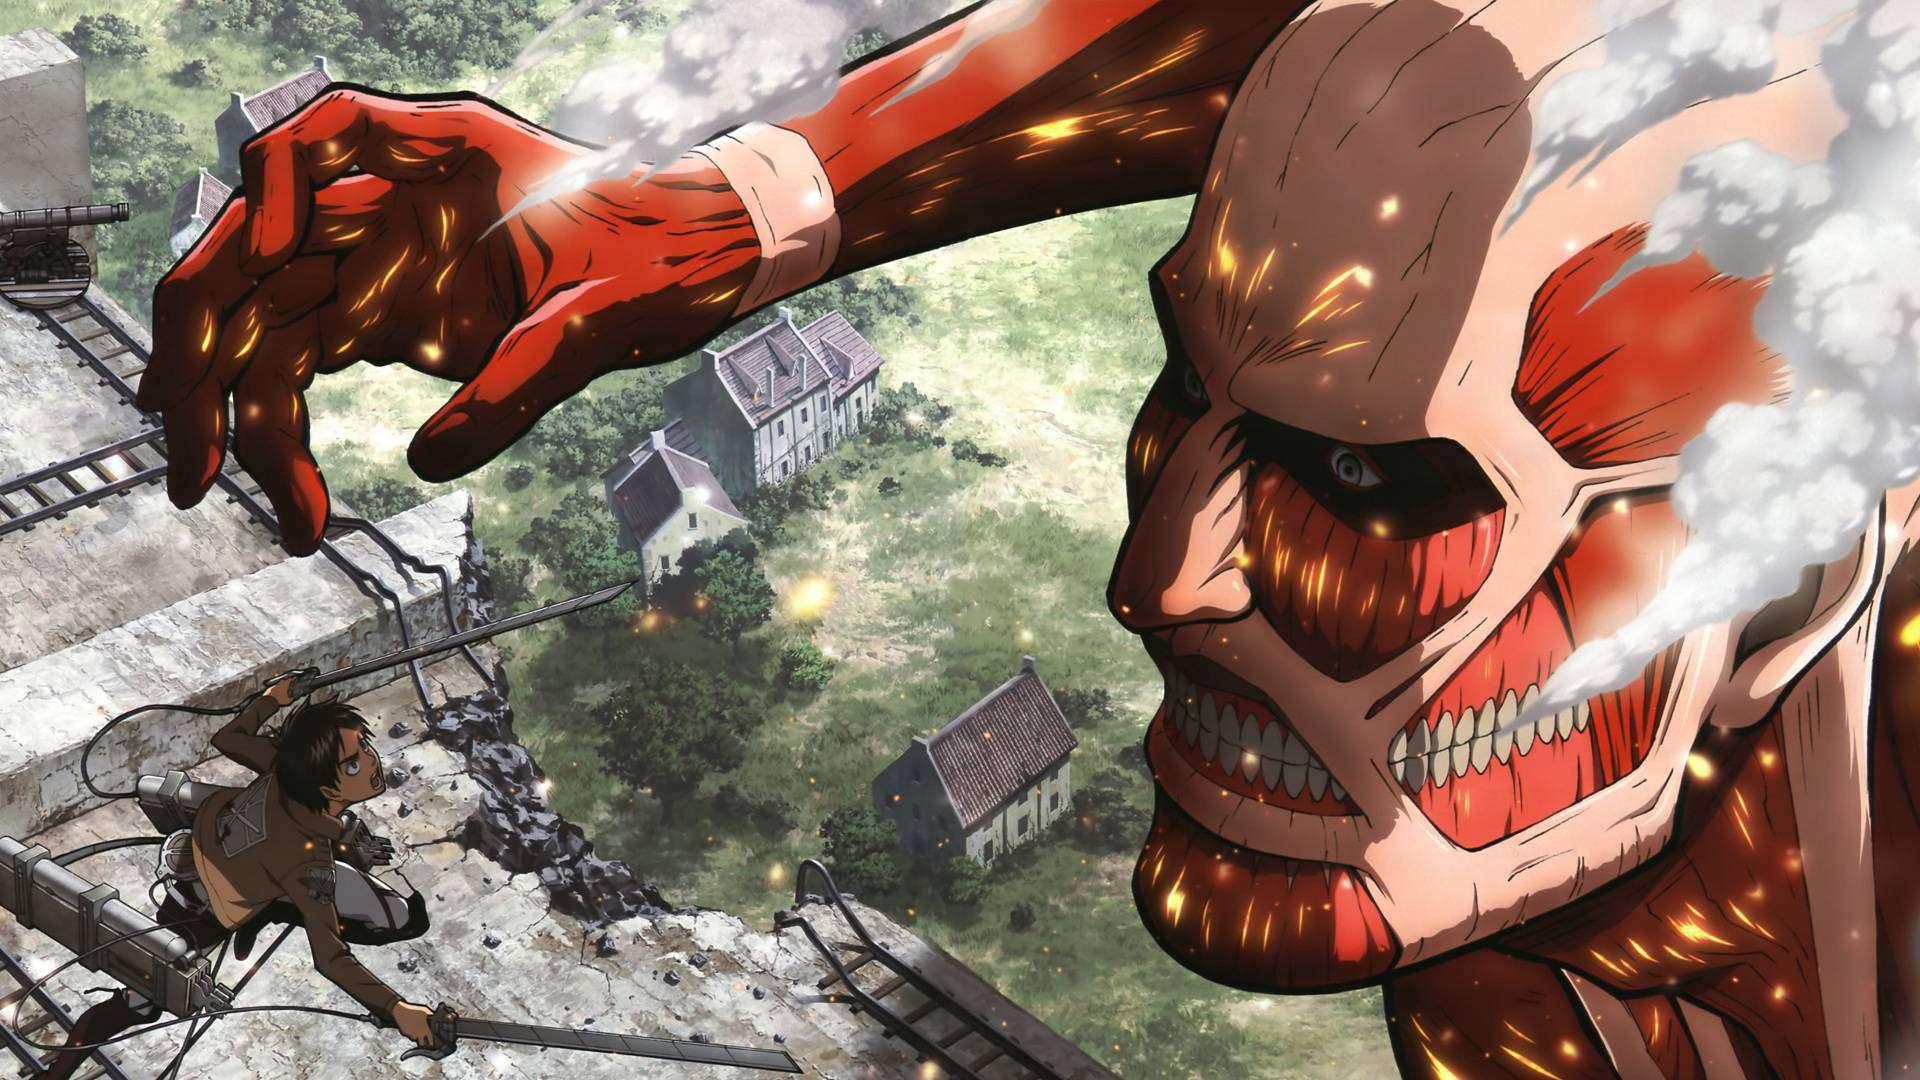 1920x1080 Attack on Titan Reel Previews Season 4 Spoilers